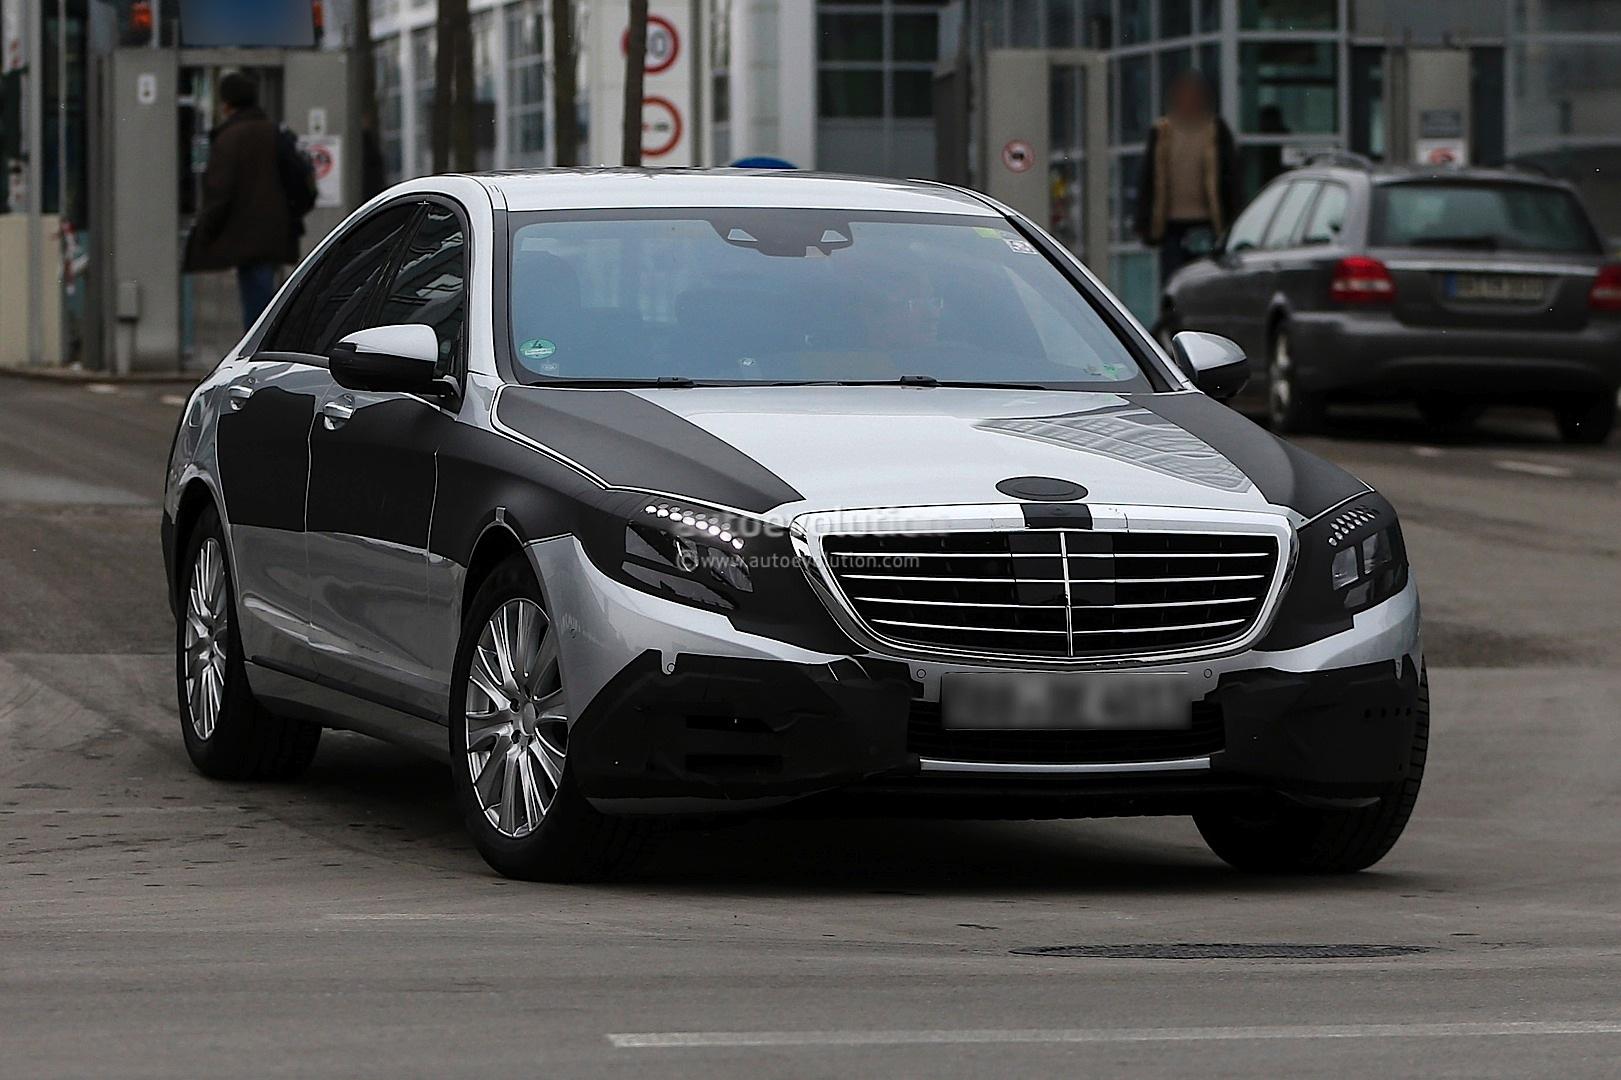 Spyshots 2014 Mercedes S Class Loses More Camo